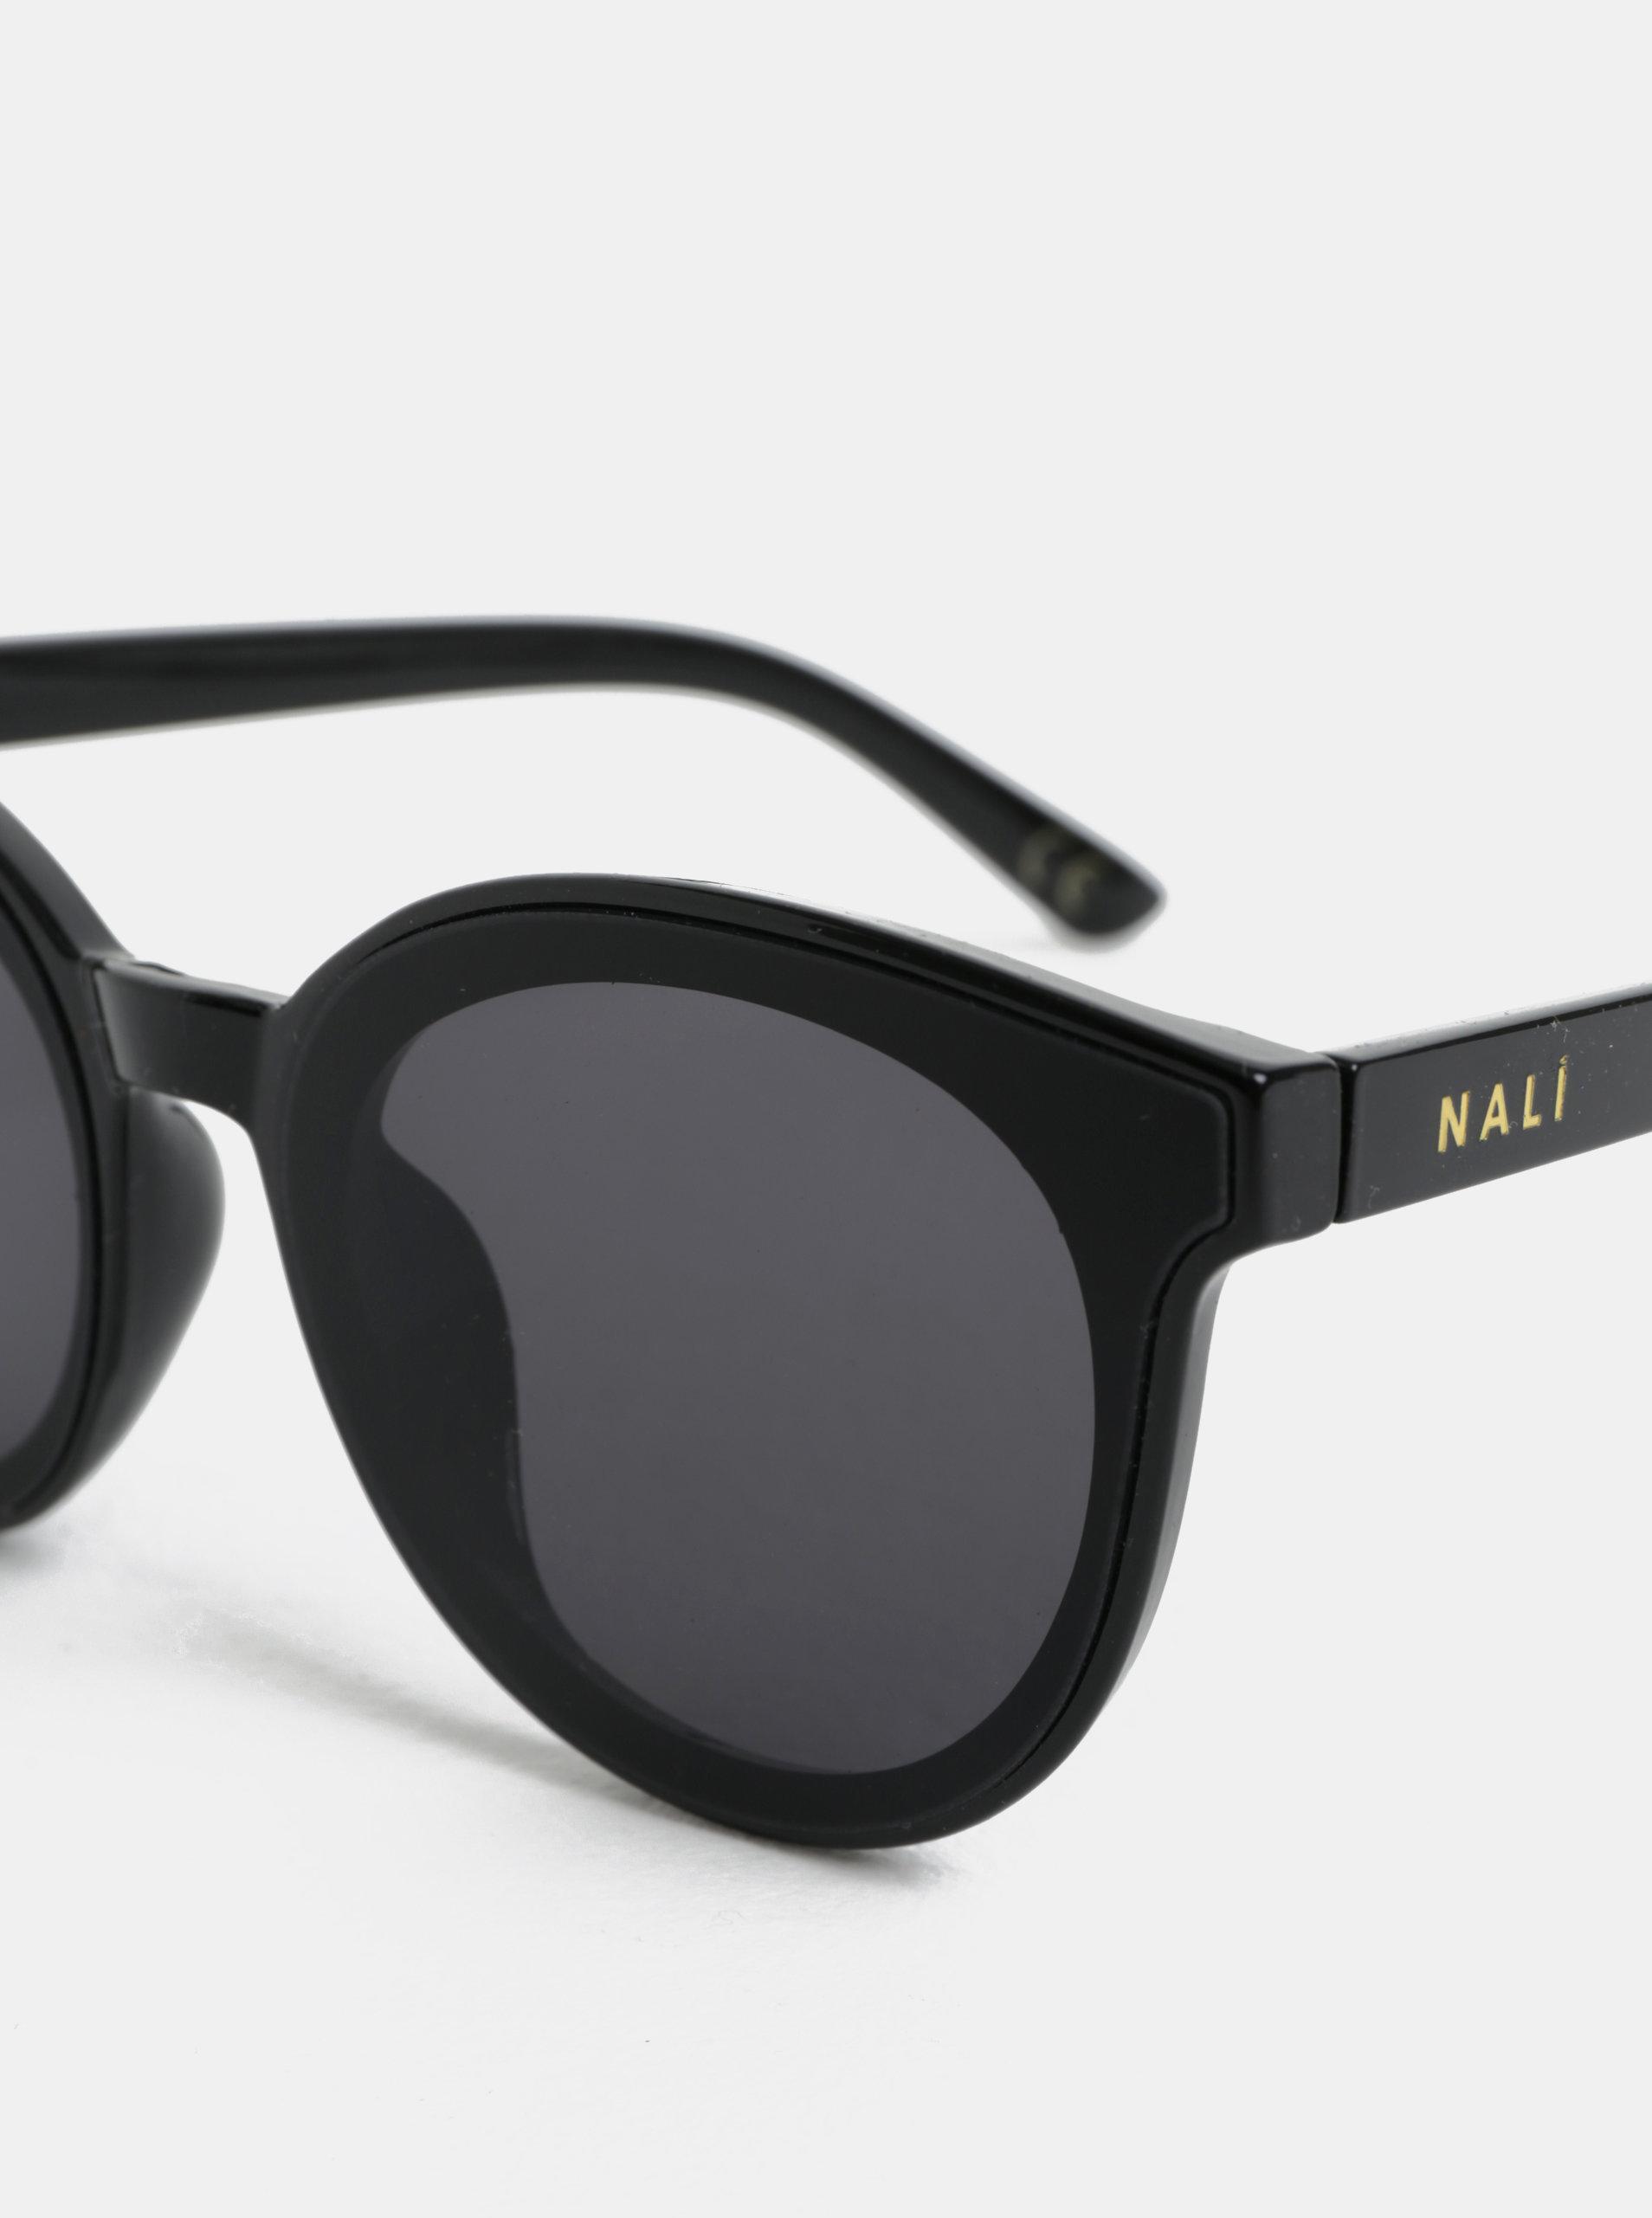 Čierne slnečné okuliare Nalí ... c49f6ccfcf2